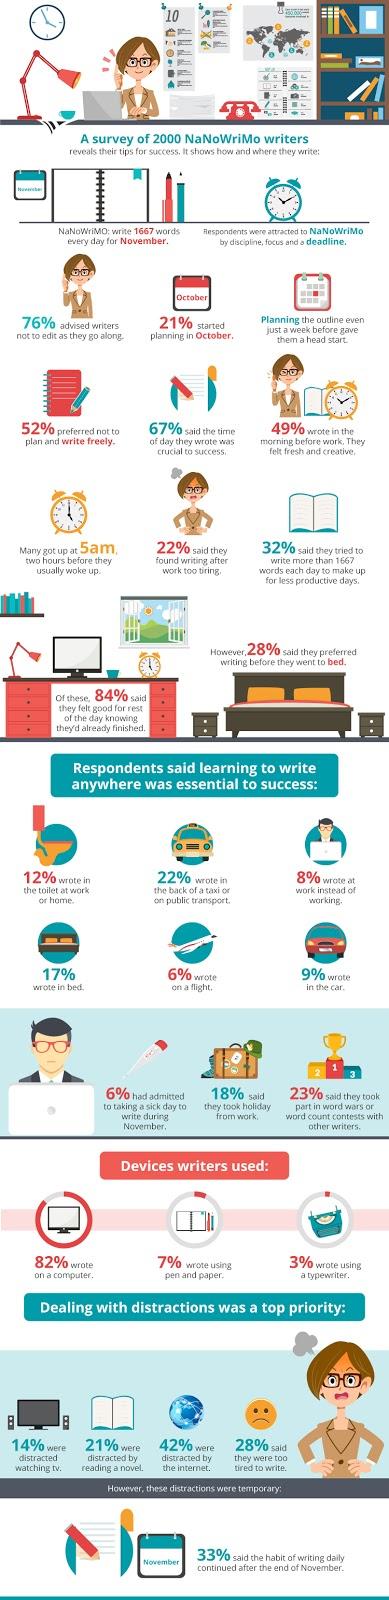 Nanowrimo survey, infographic